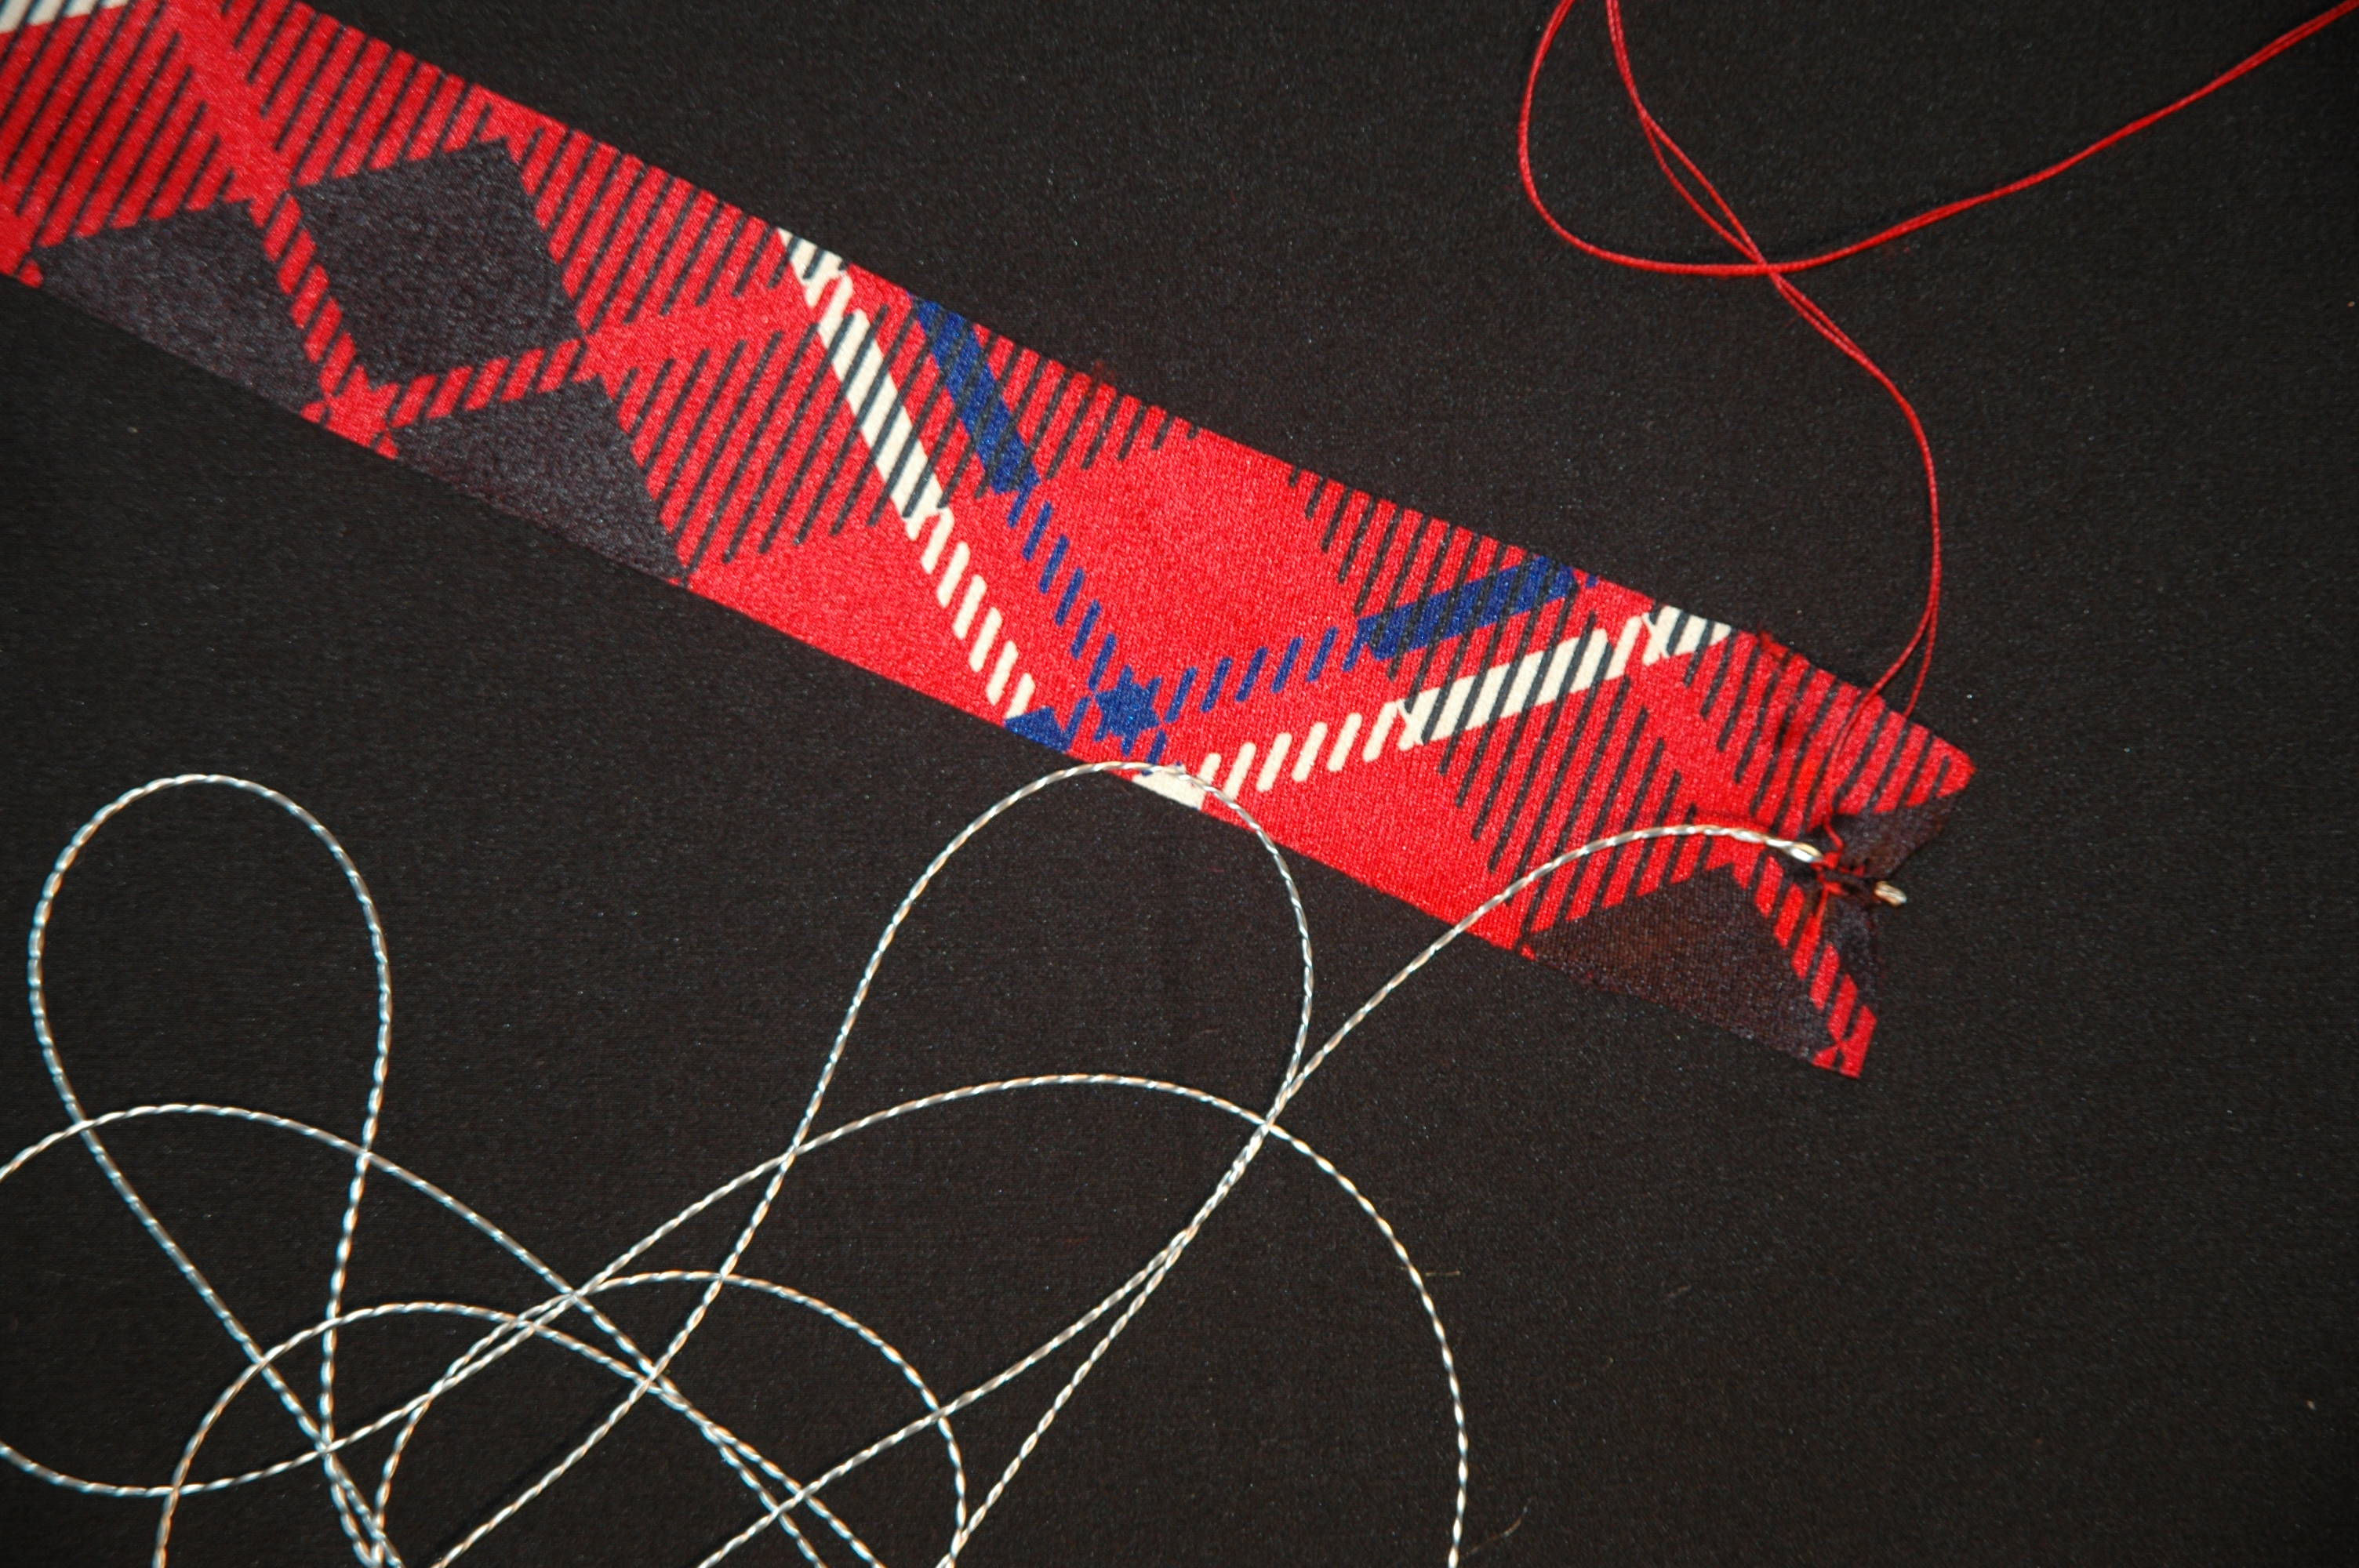 Conductive Thread inside a Fabric Bias Tube aka Tubes of Conductiveness